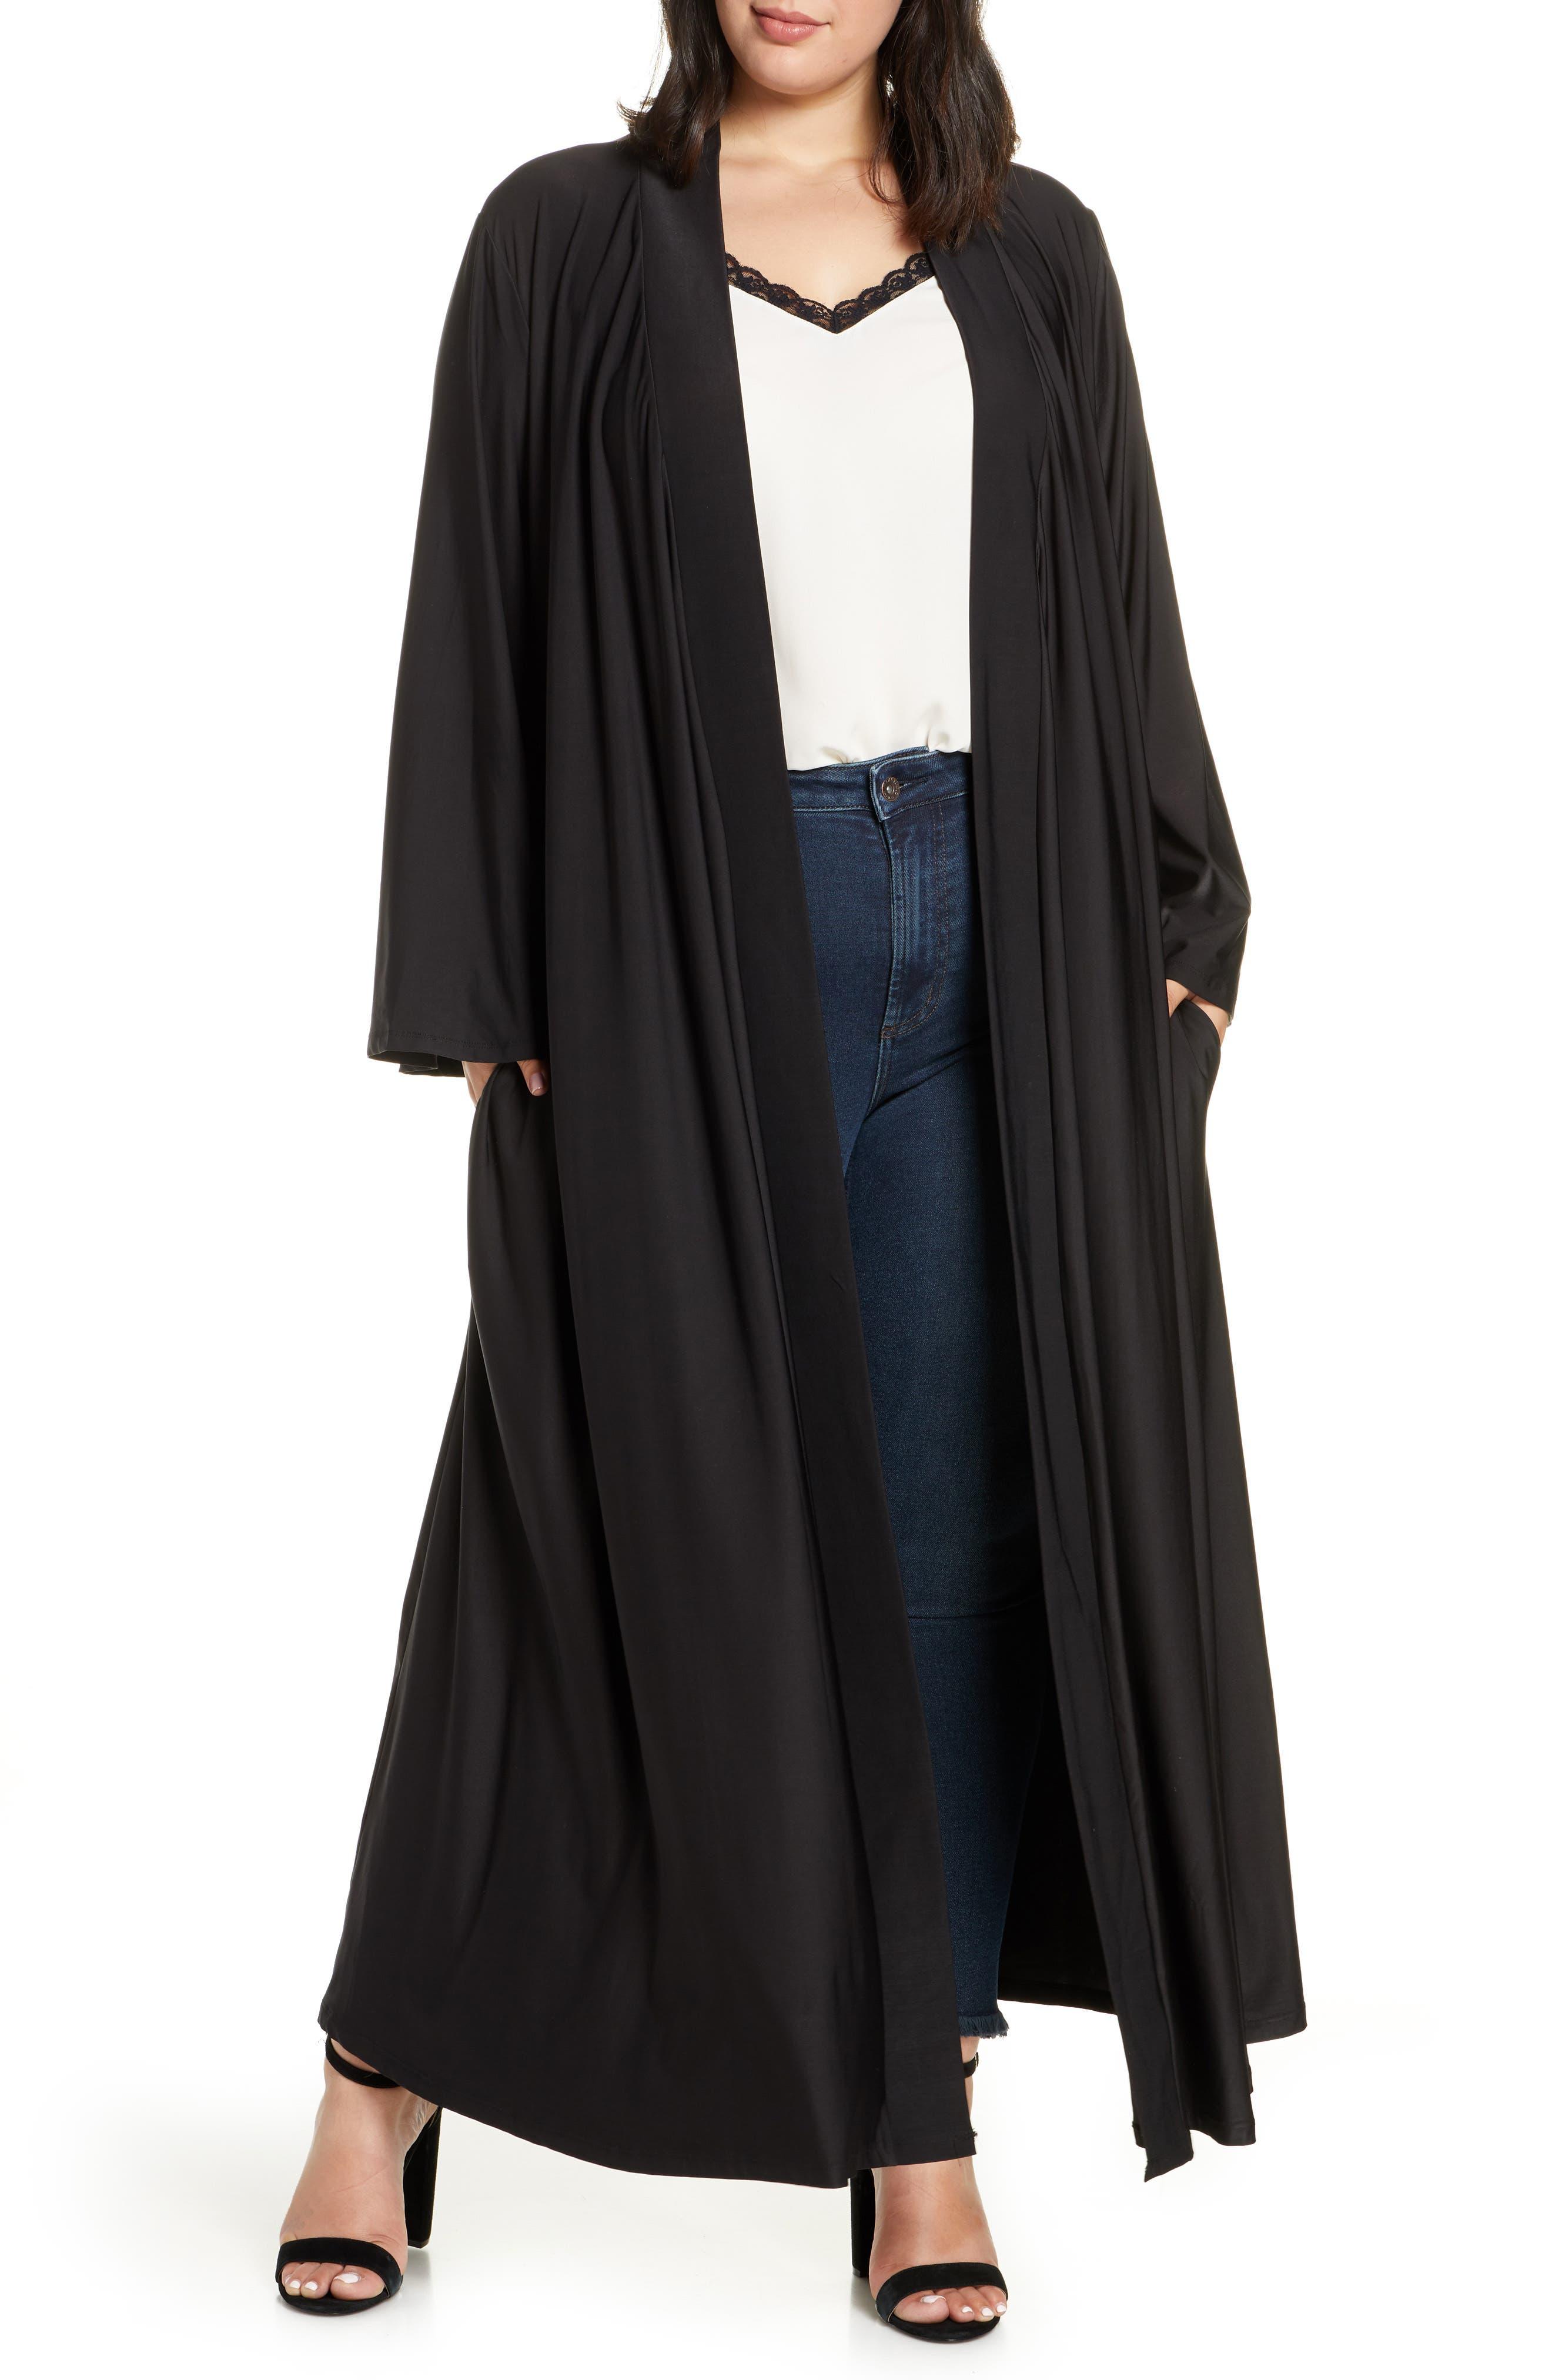 Shawls & Wraps | Fur Stole, Lace, Fringe Plus Size Womens Coldesina Dylan Belted Duster Size XL1X - Black $98.00 AT vintagedancer.com